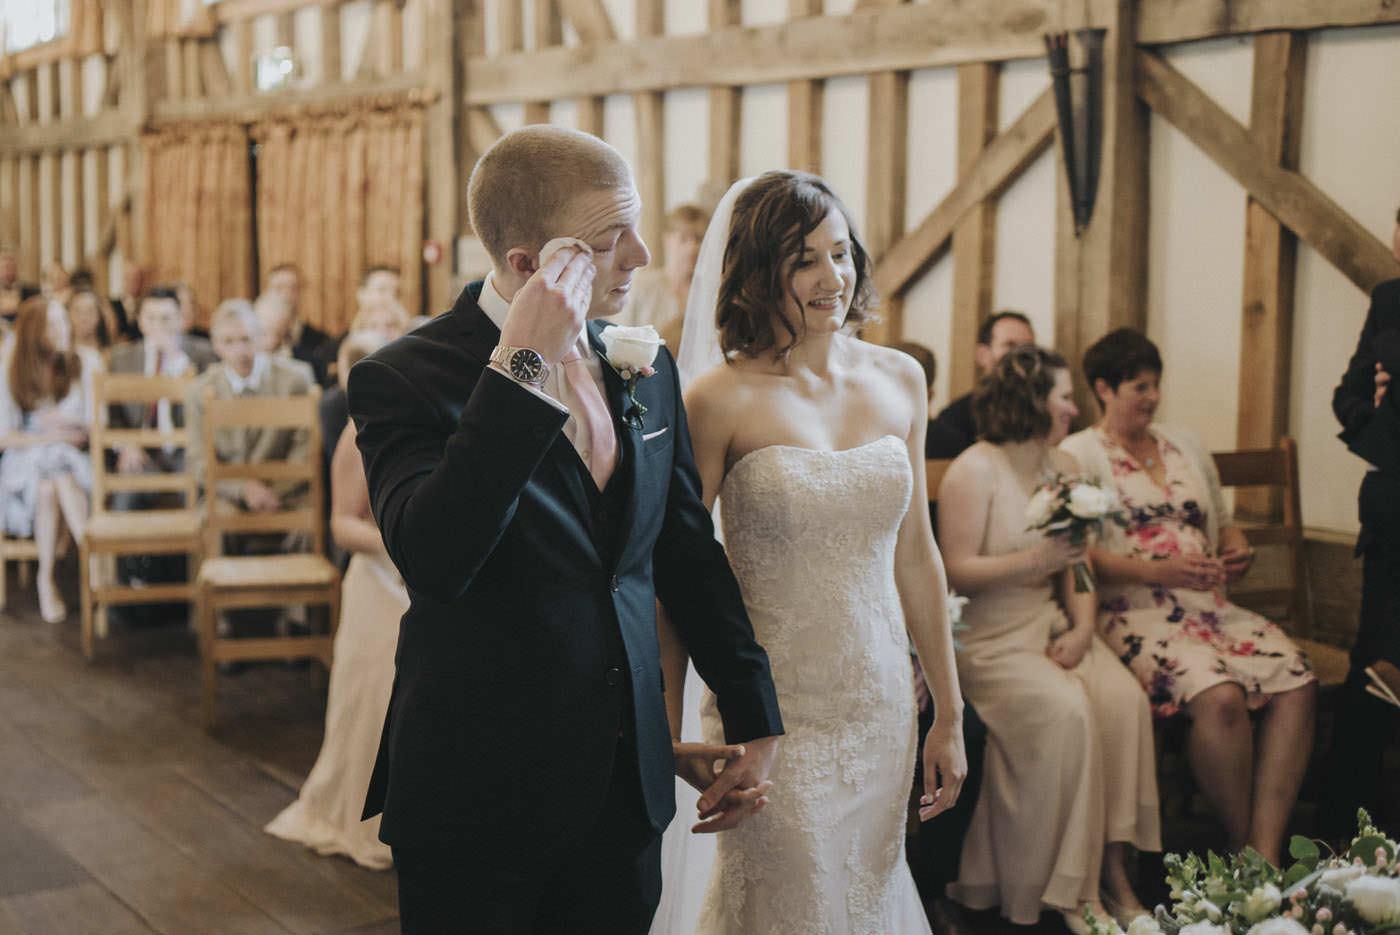 adamzoe gate street barn wedding photographer 0049